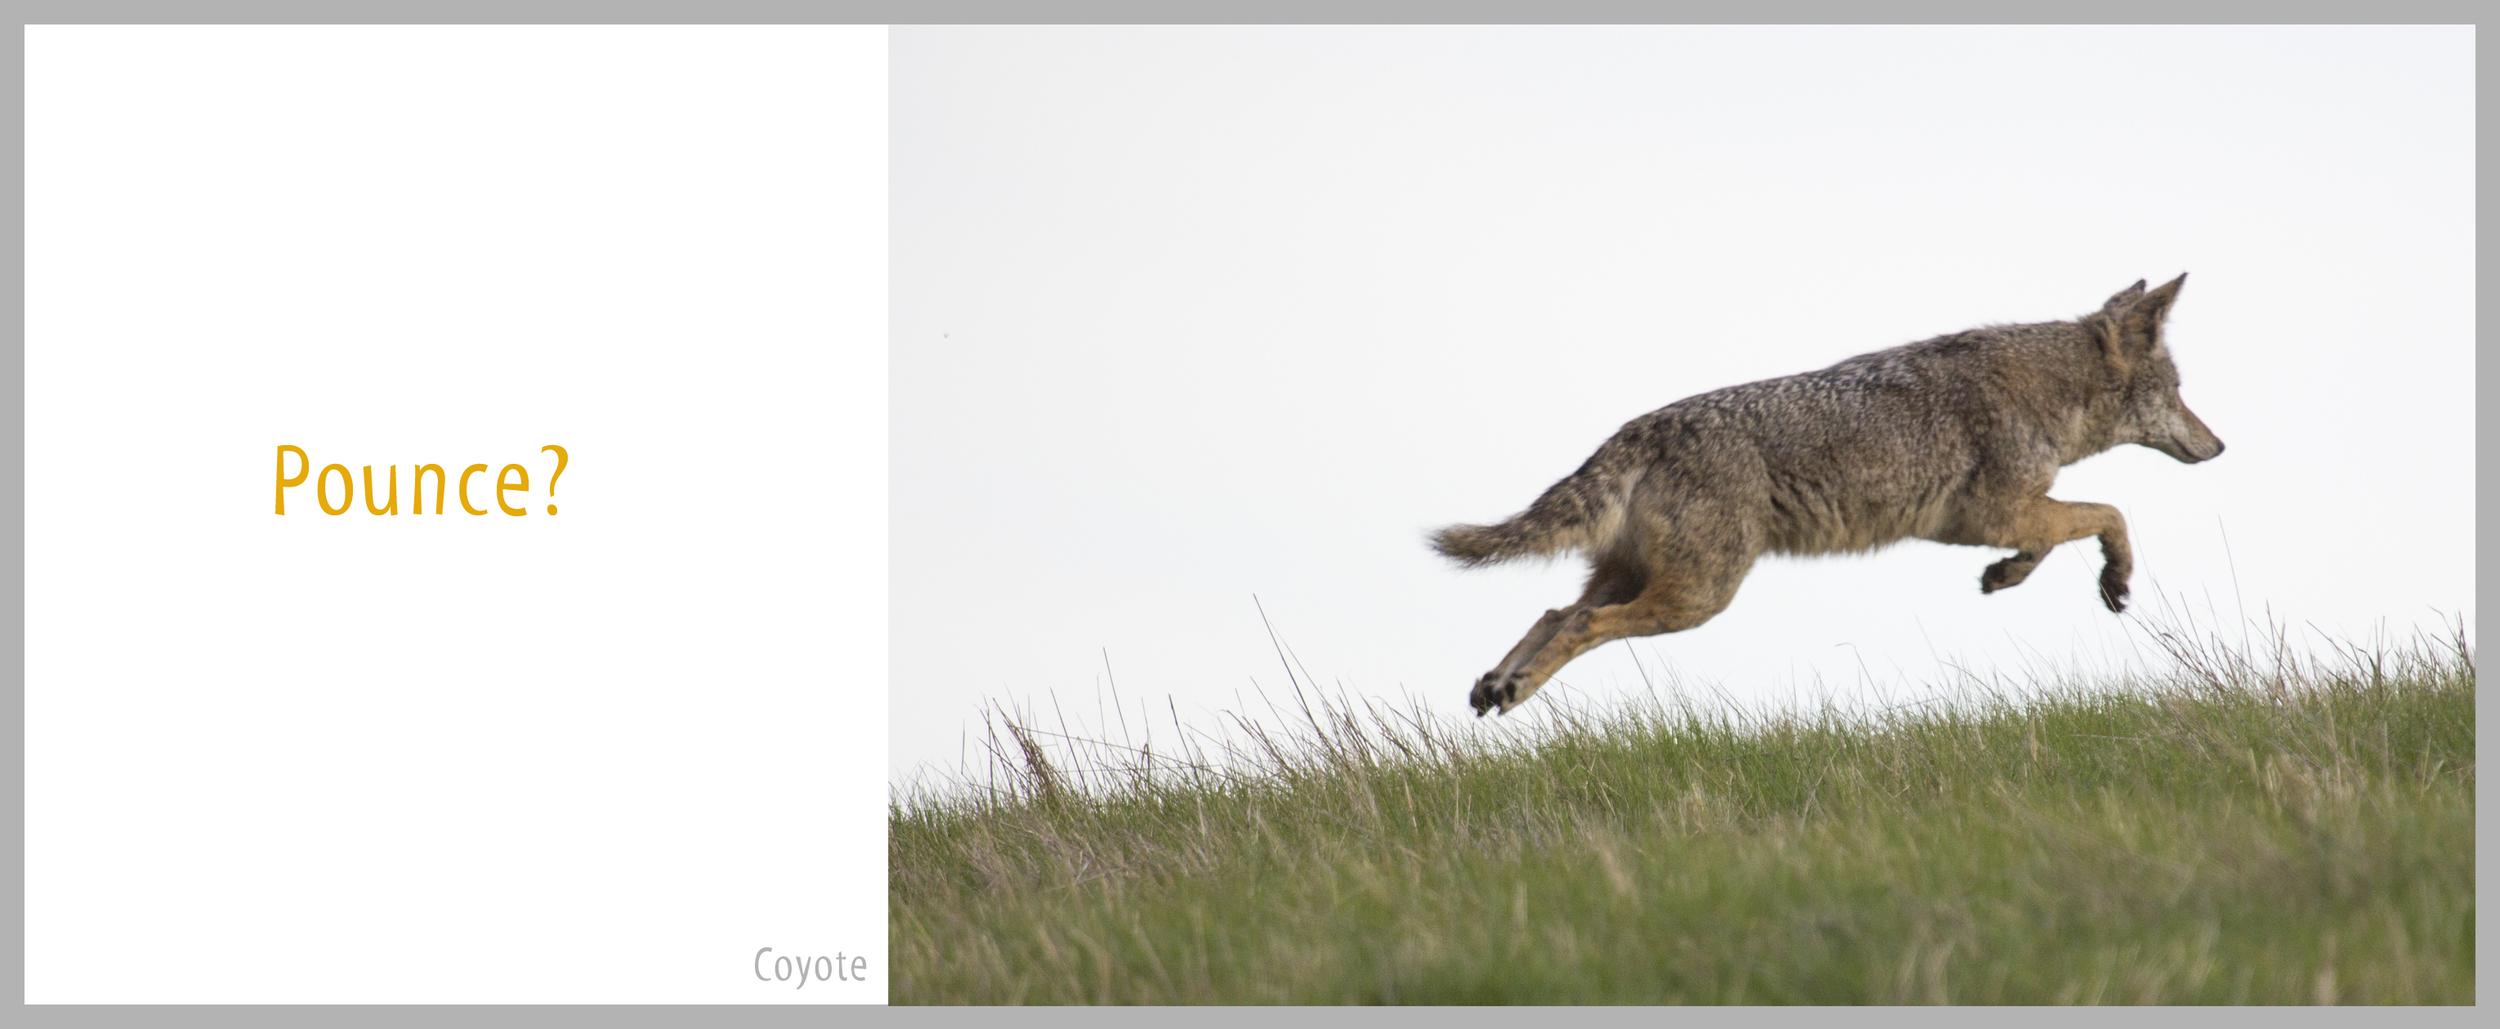 04Bond-2716.Coyote.jpg